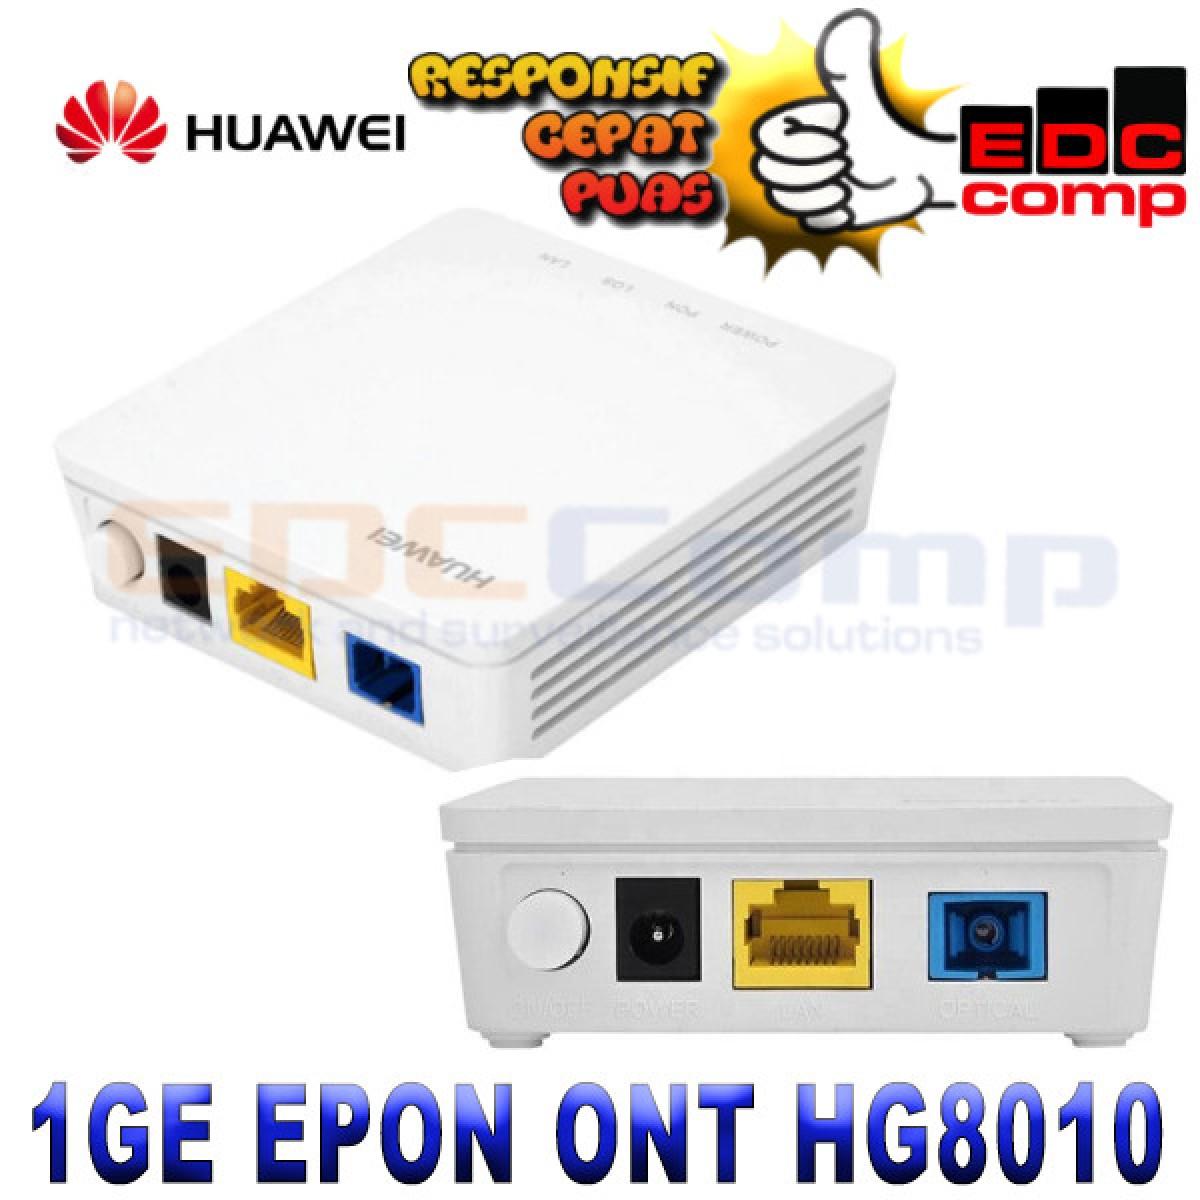 Huawei HG8010 1GE EPON ONT| EPON ONU HG8010 1GE - EdcComp